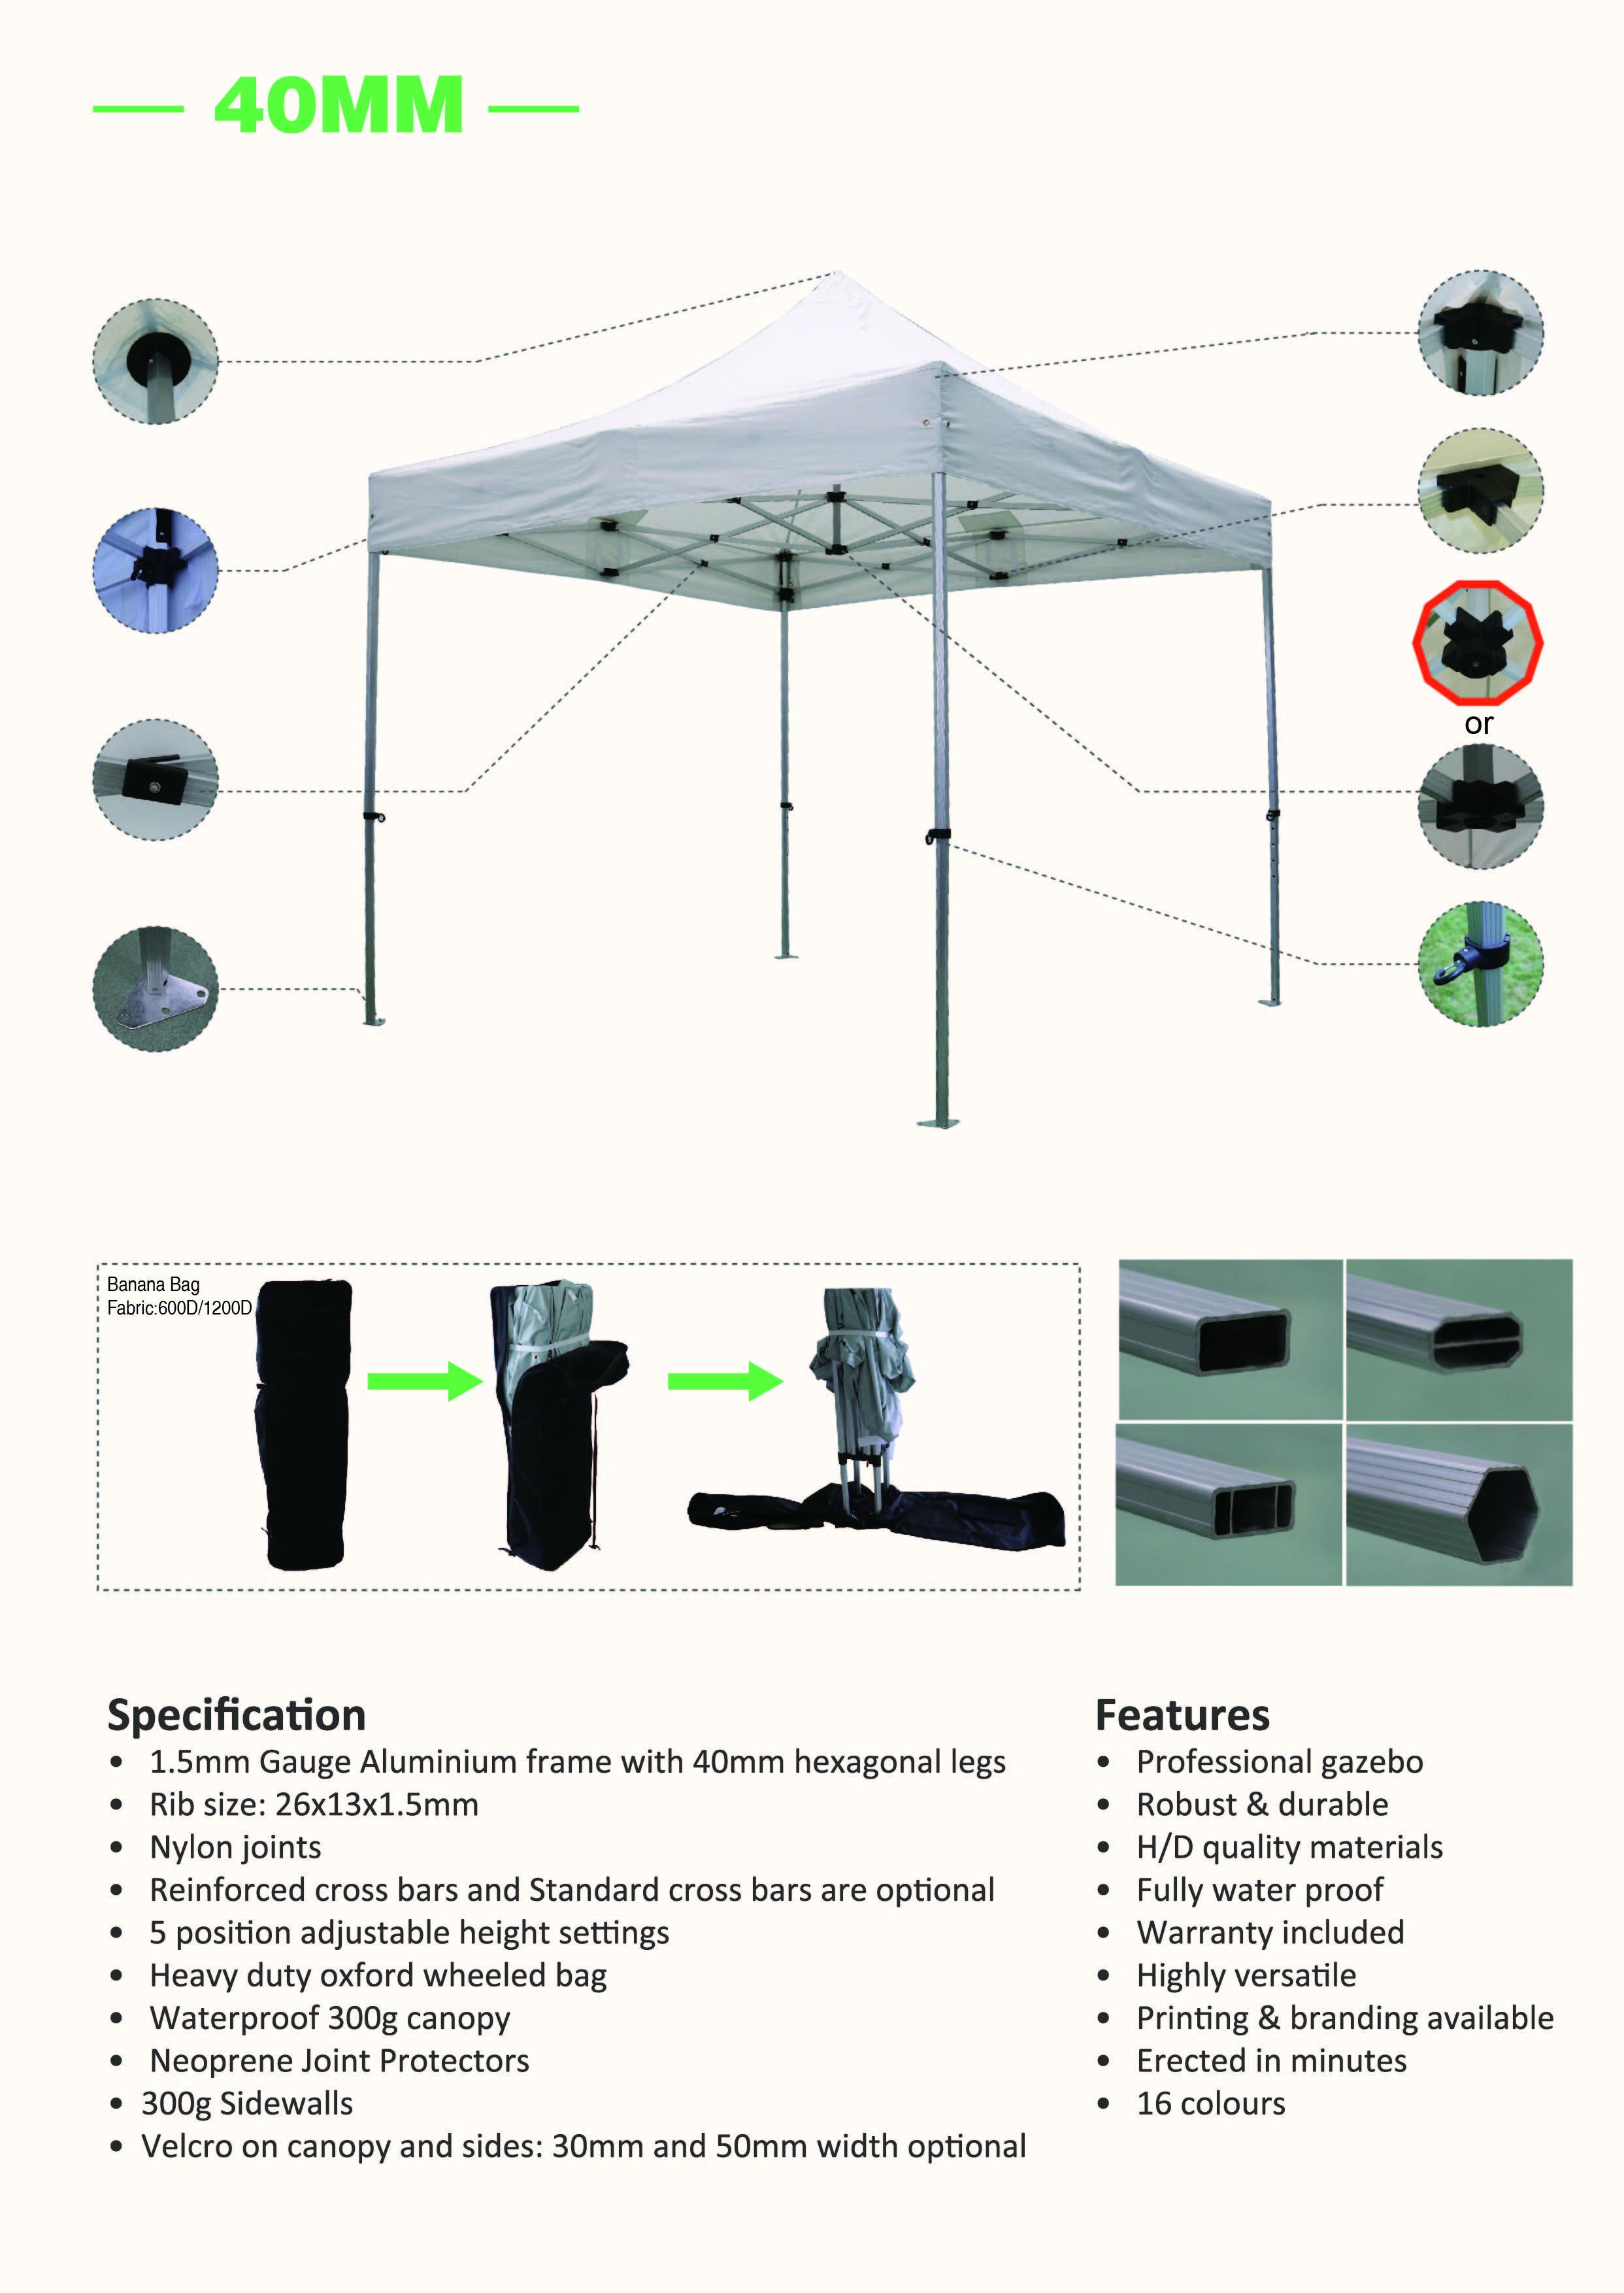 folding gazebos folding up tables compact gazebos caravan tent rh pinterest com